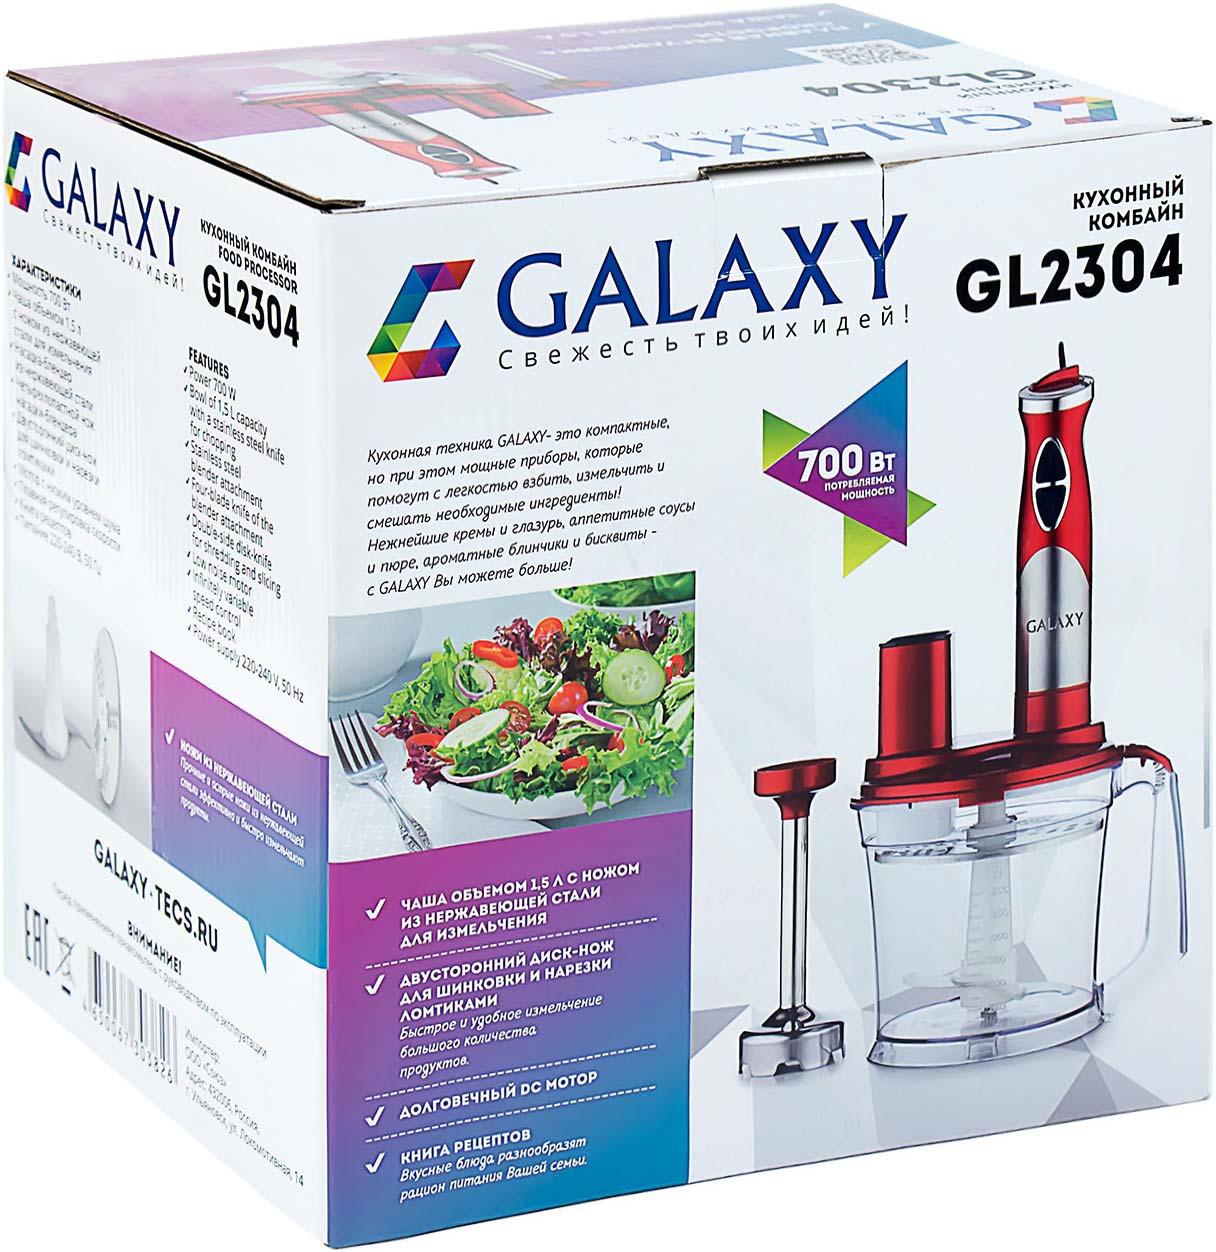 Кухонный комбайн Galaxy GL 2304, цвет: красный, серебристый Galaxy